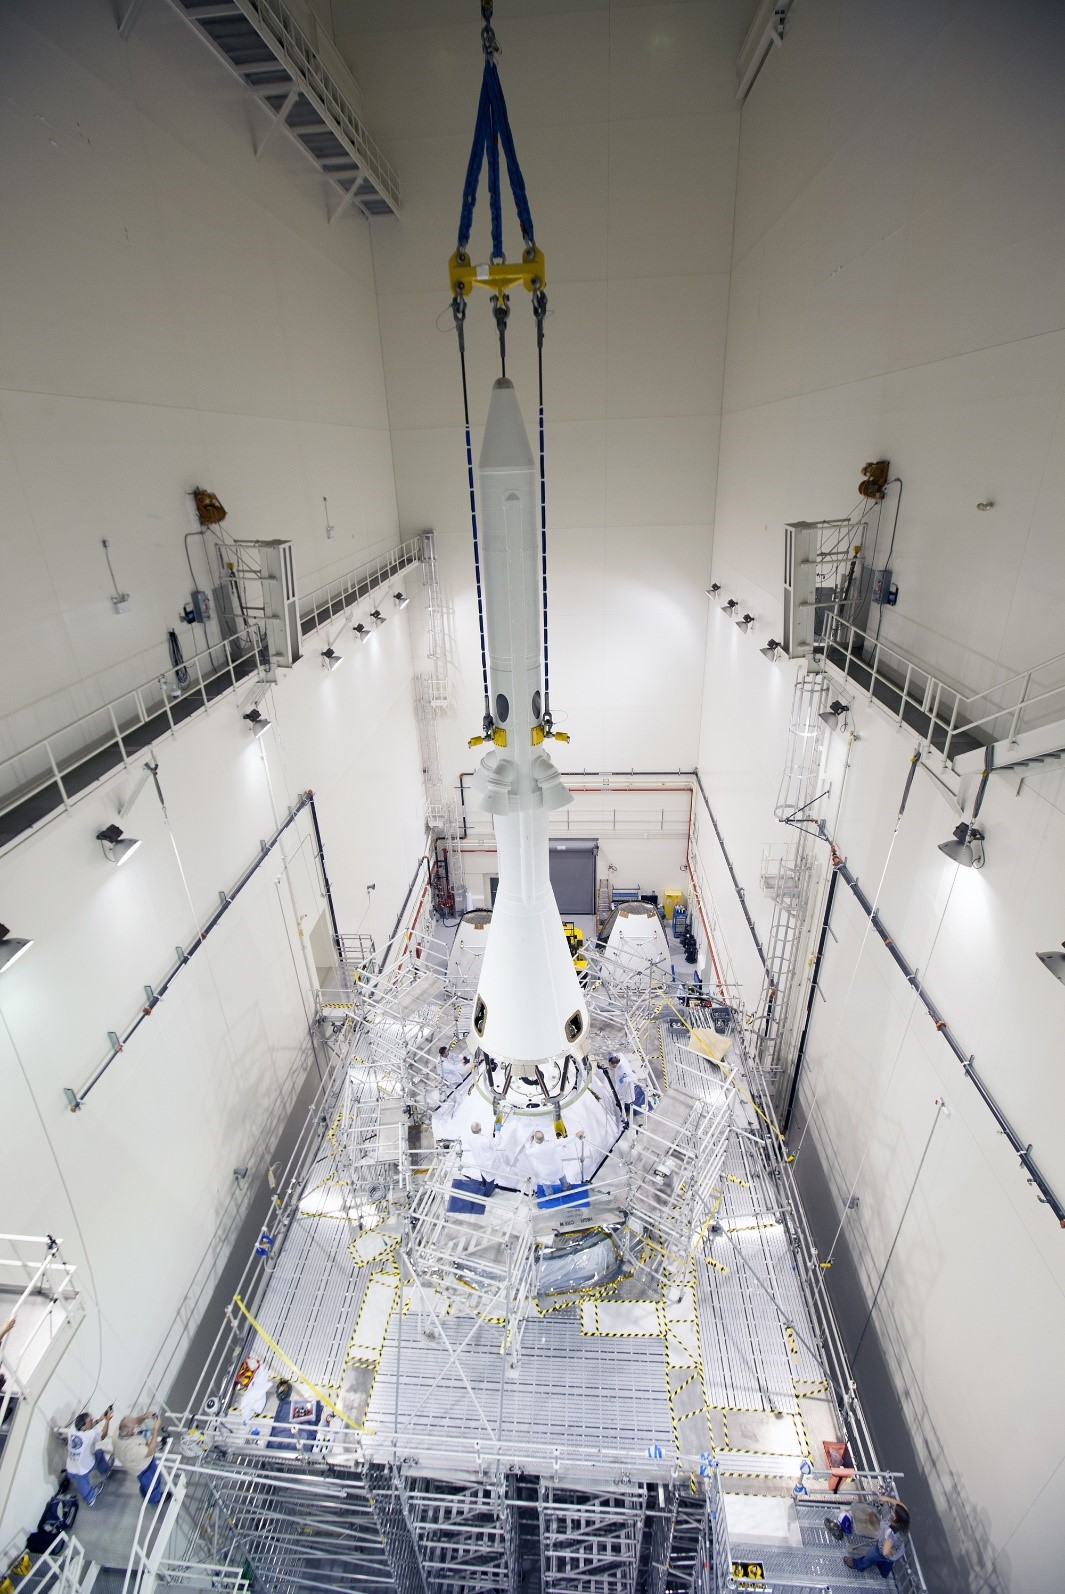 Orion Spacecraft – Exploration Flight Test-1